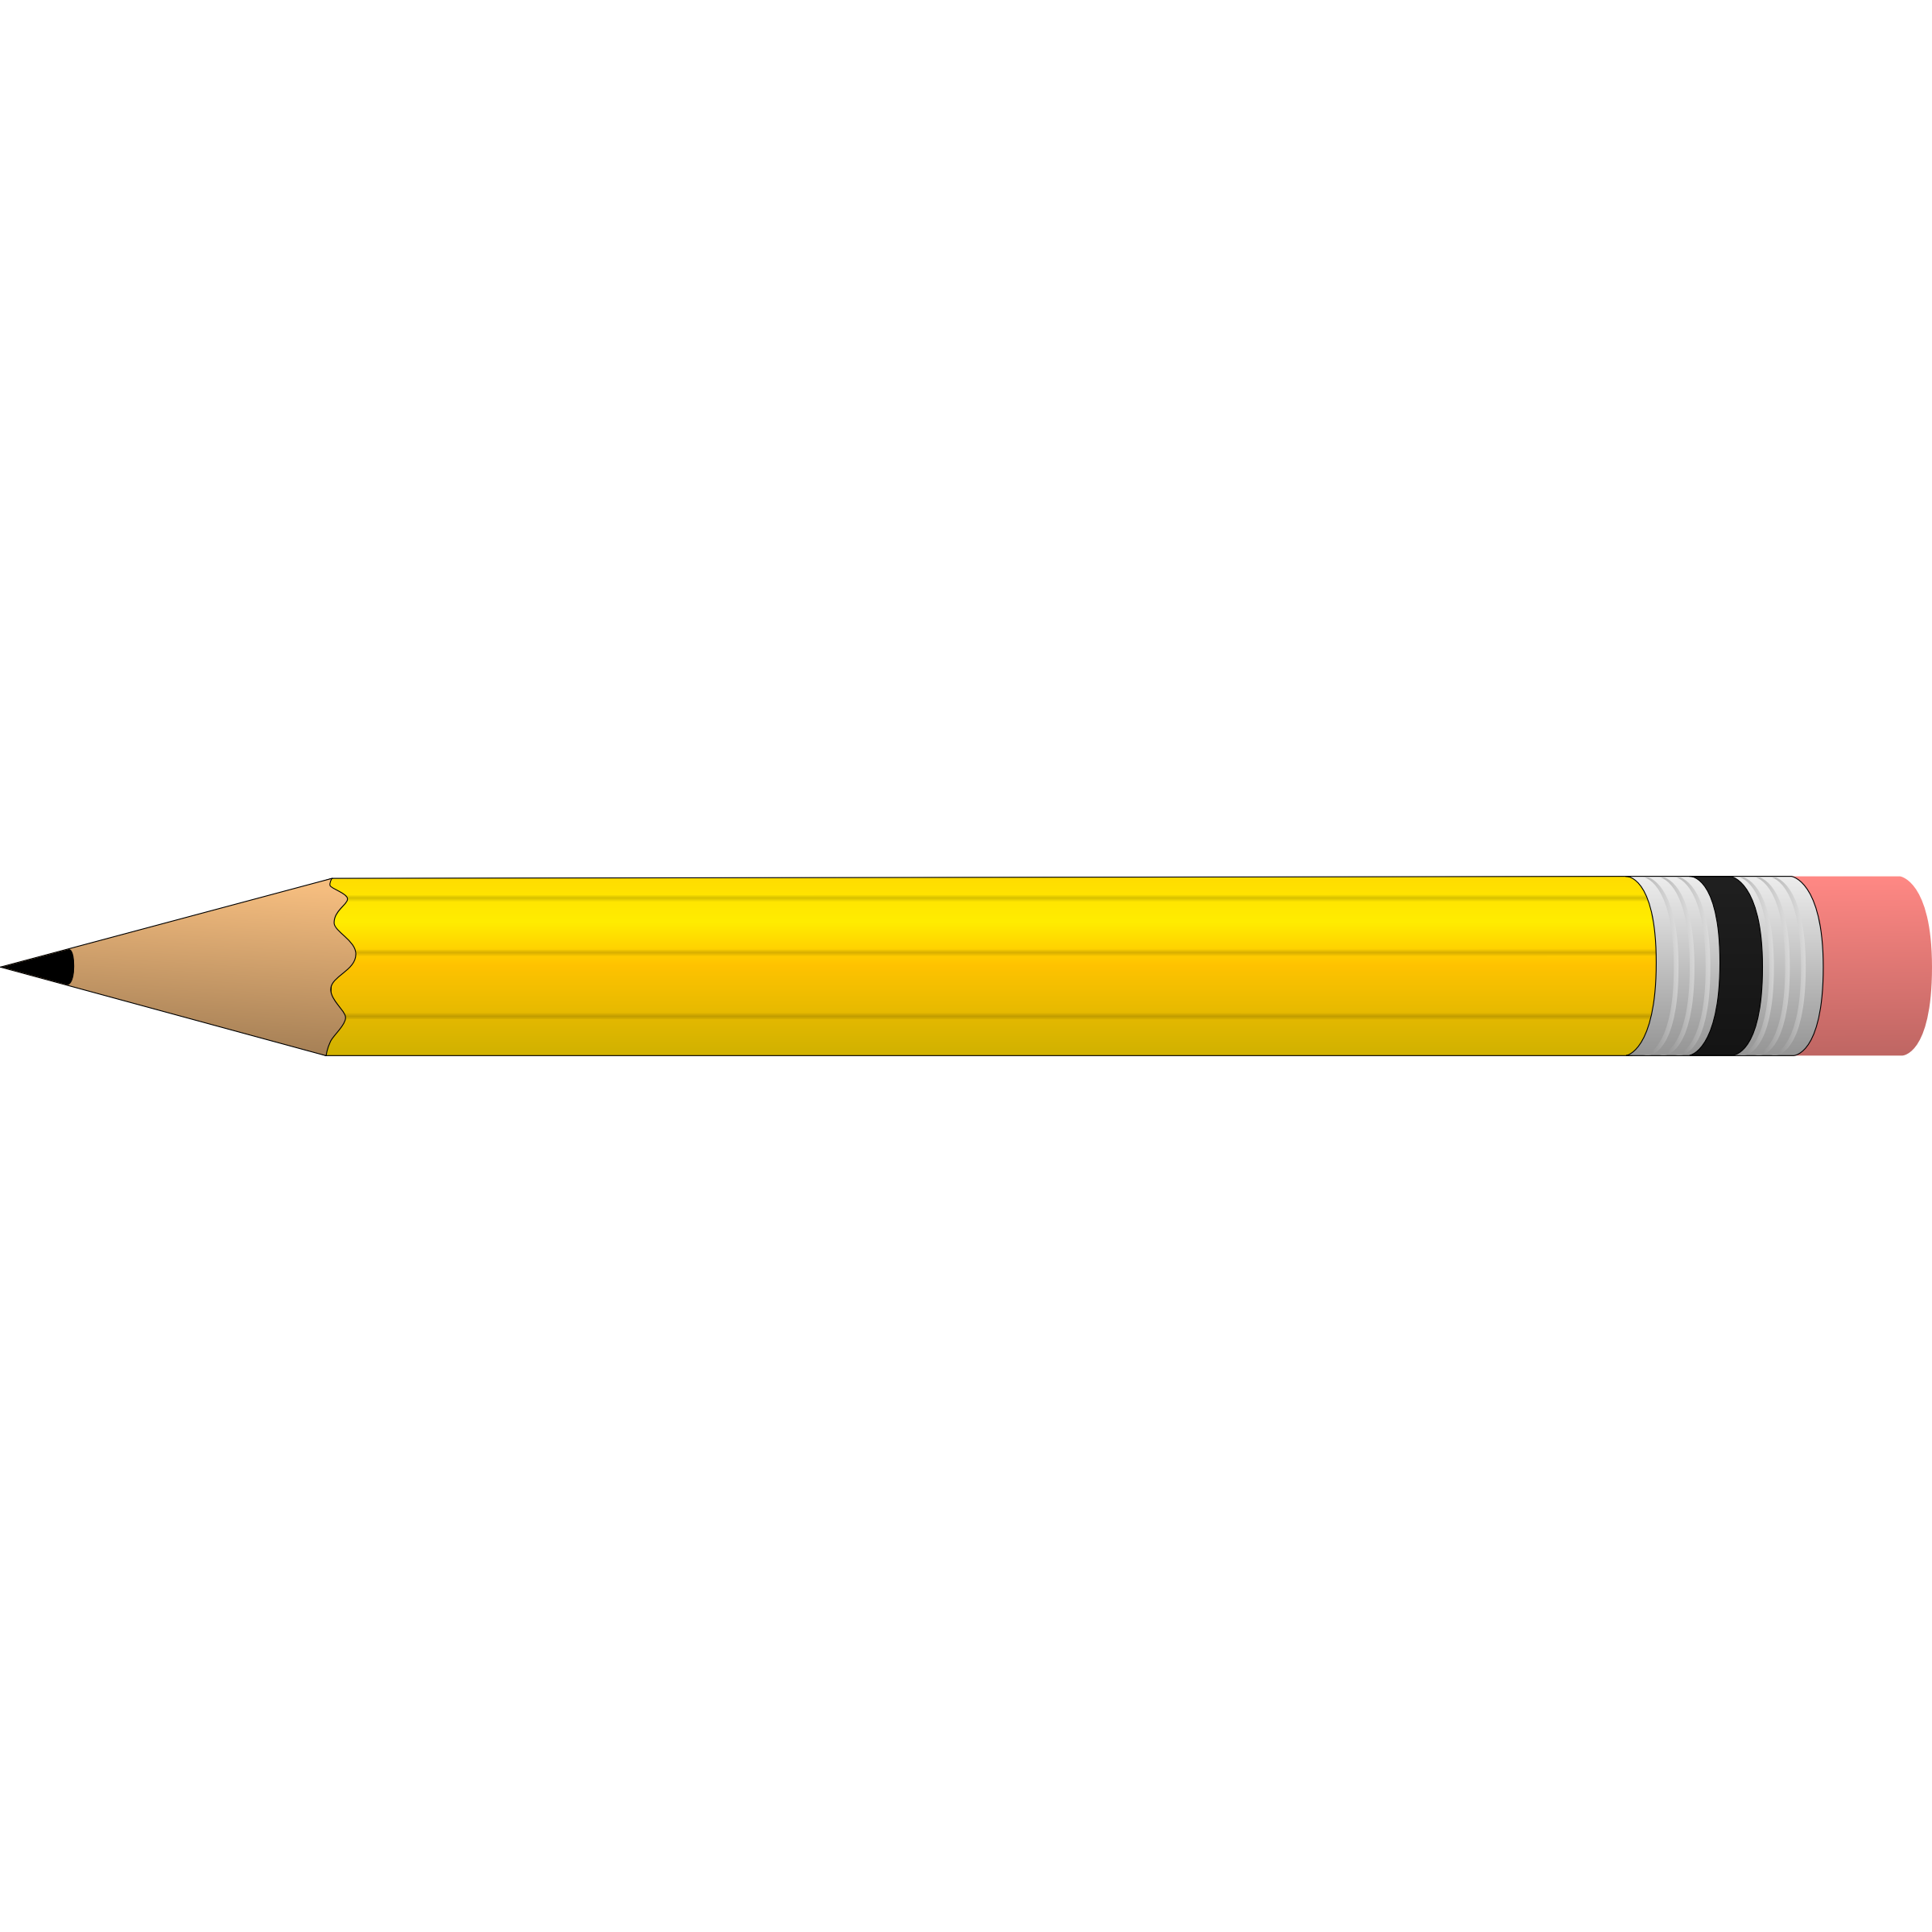 Pencil clipart images horizontal clipartfox